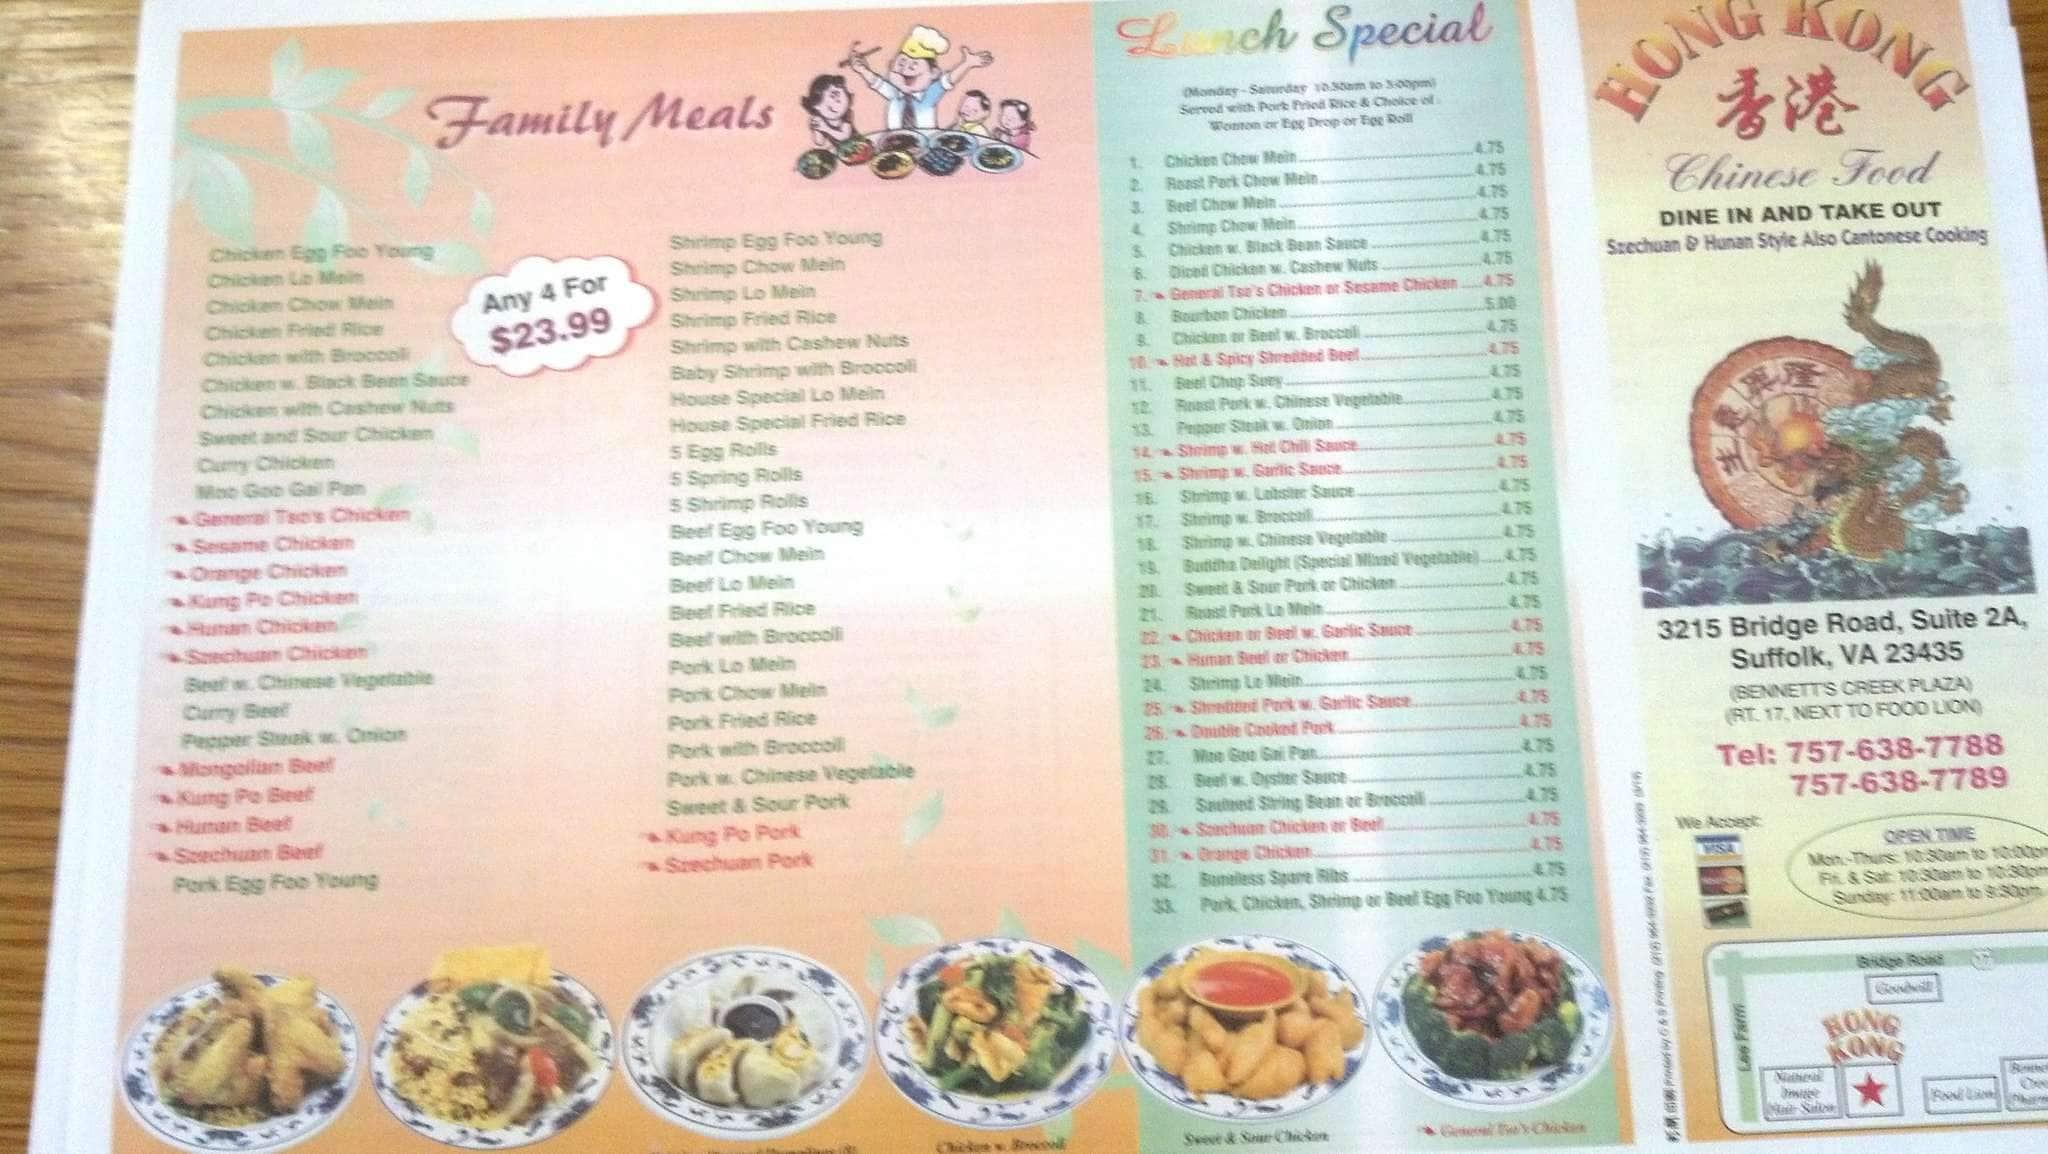 Chinese Food Suffolk Va